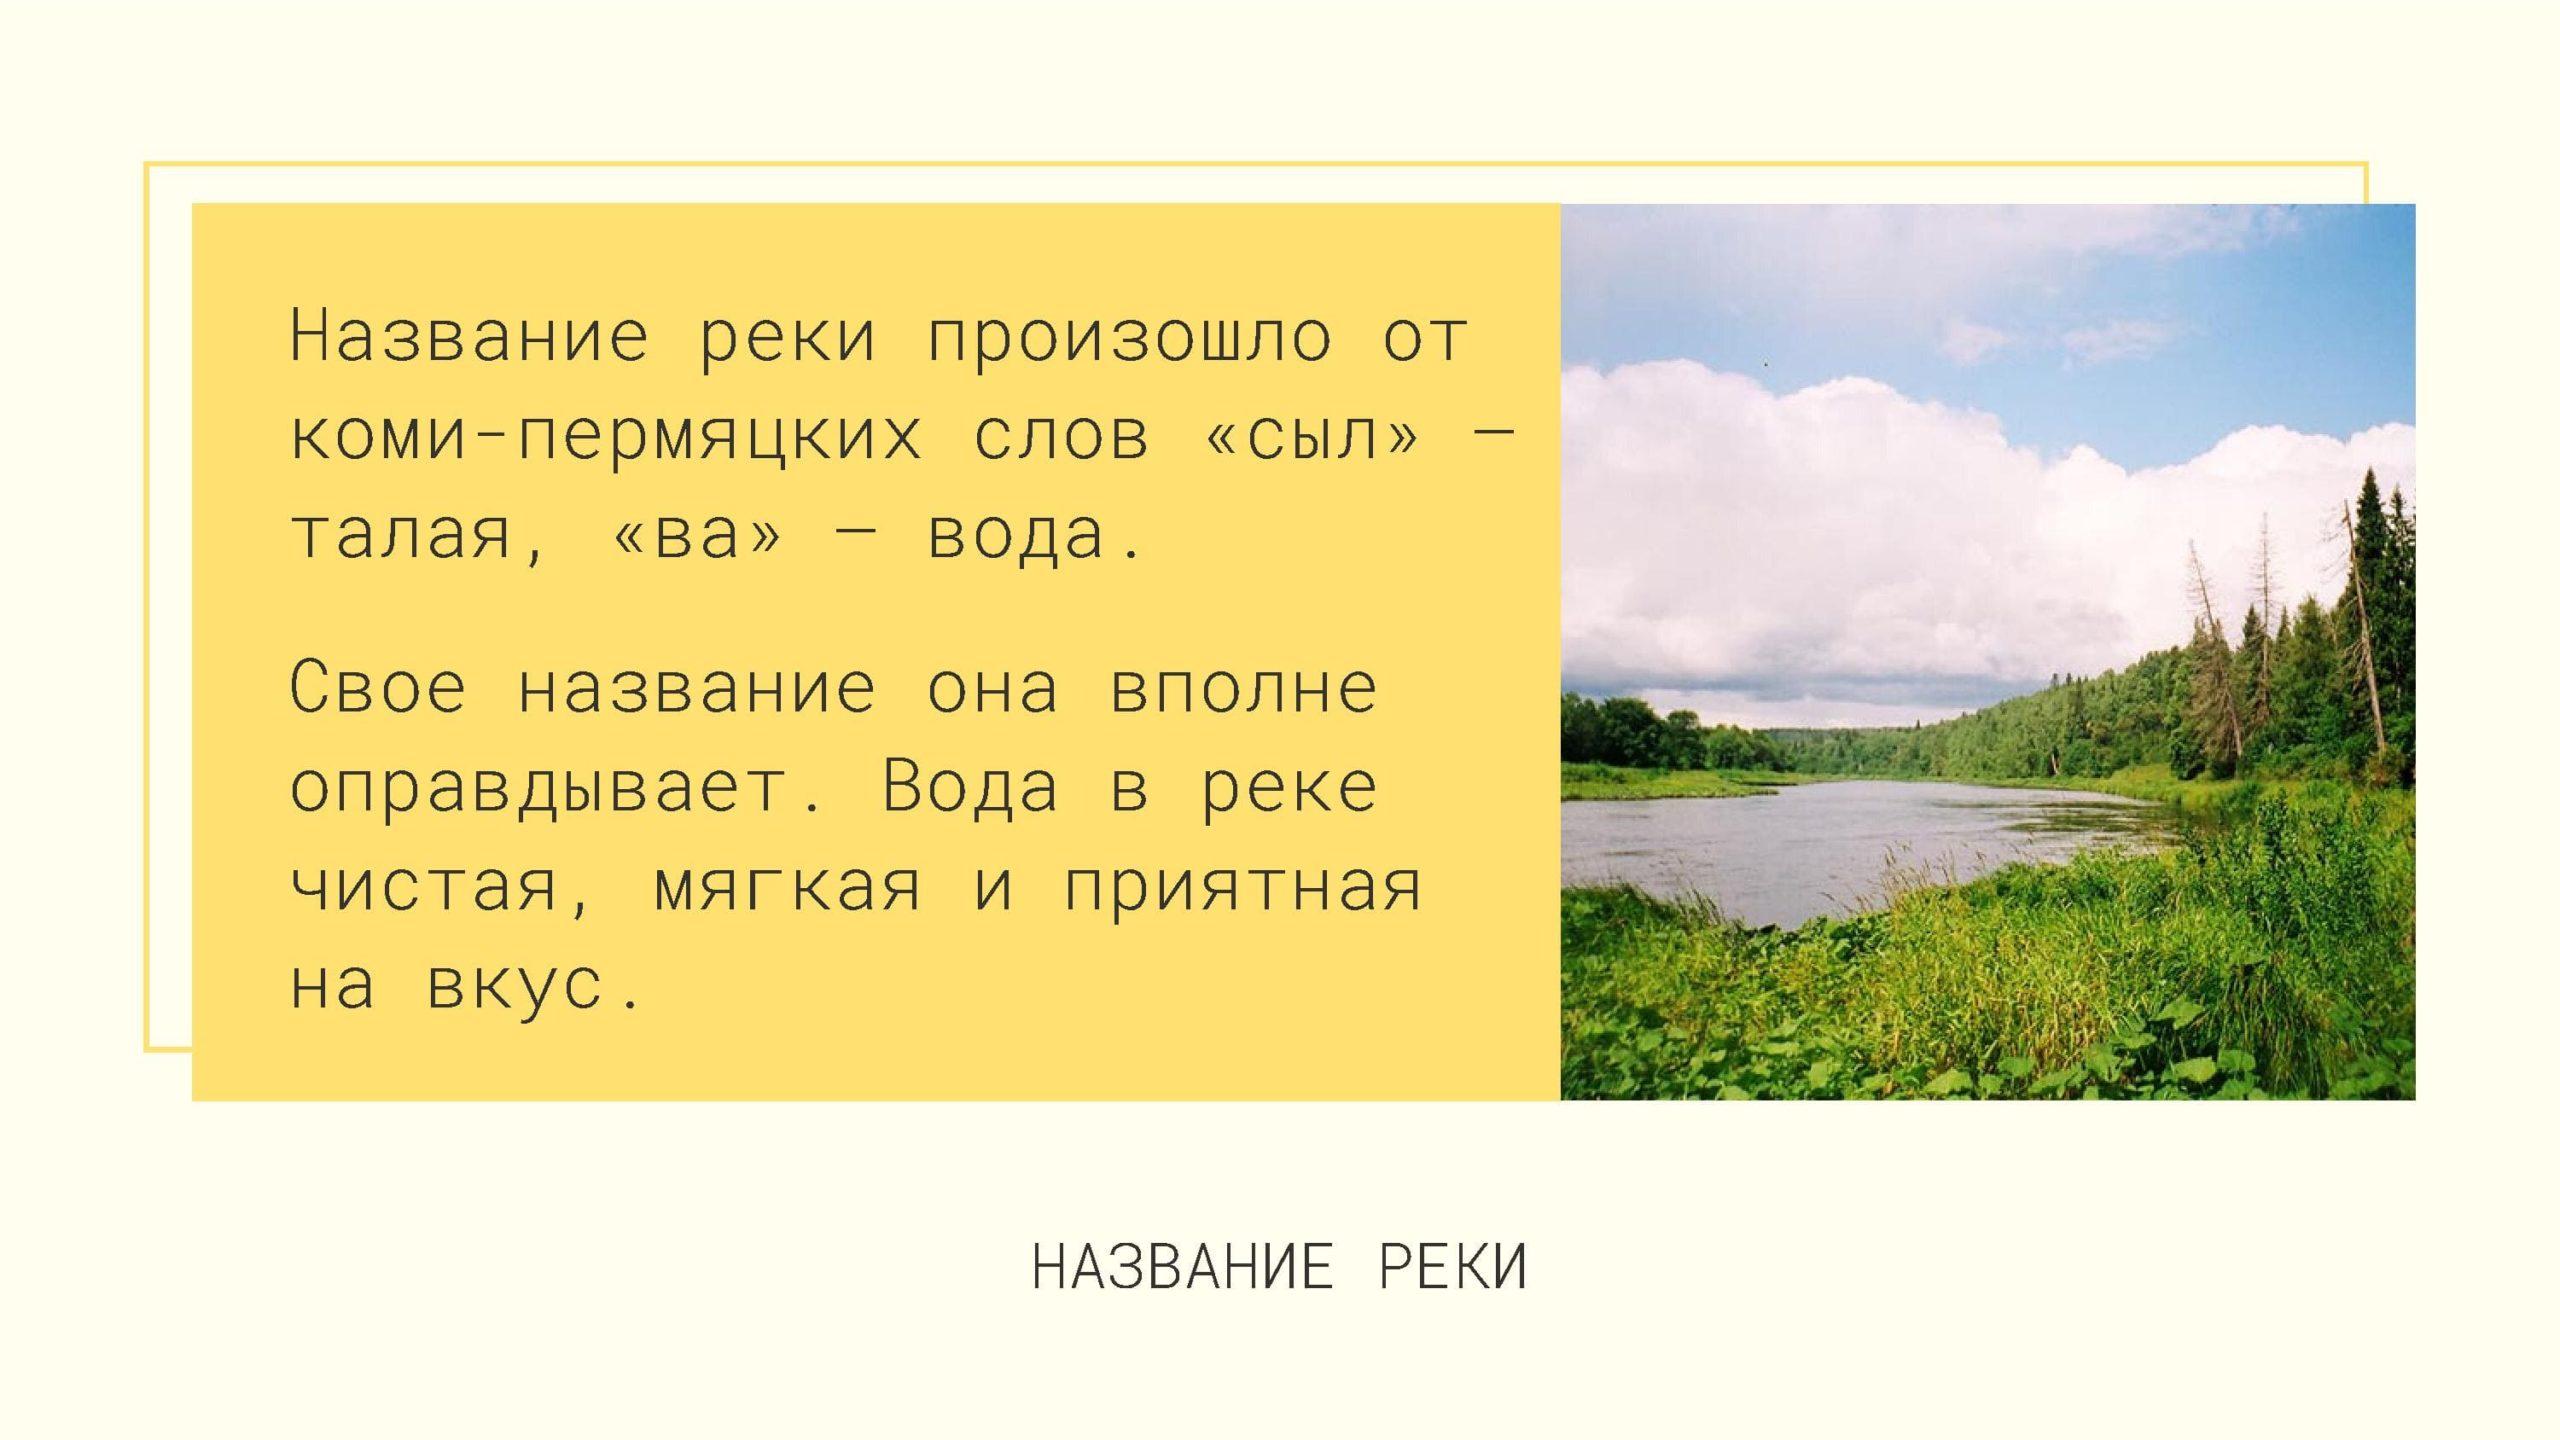 Название реки произошло от коми-пермяцких слов